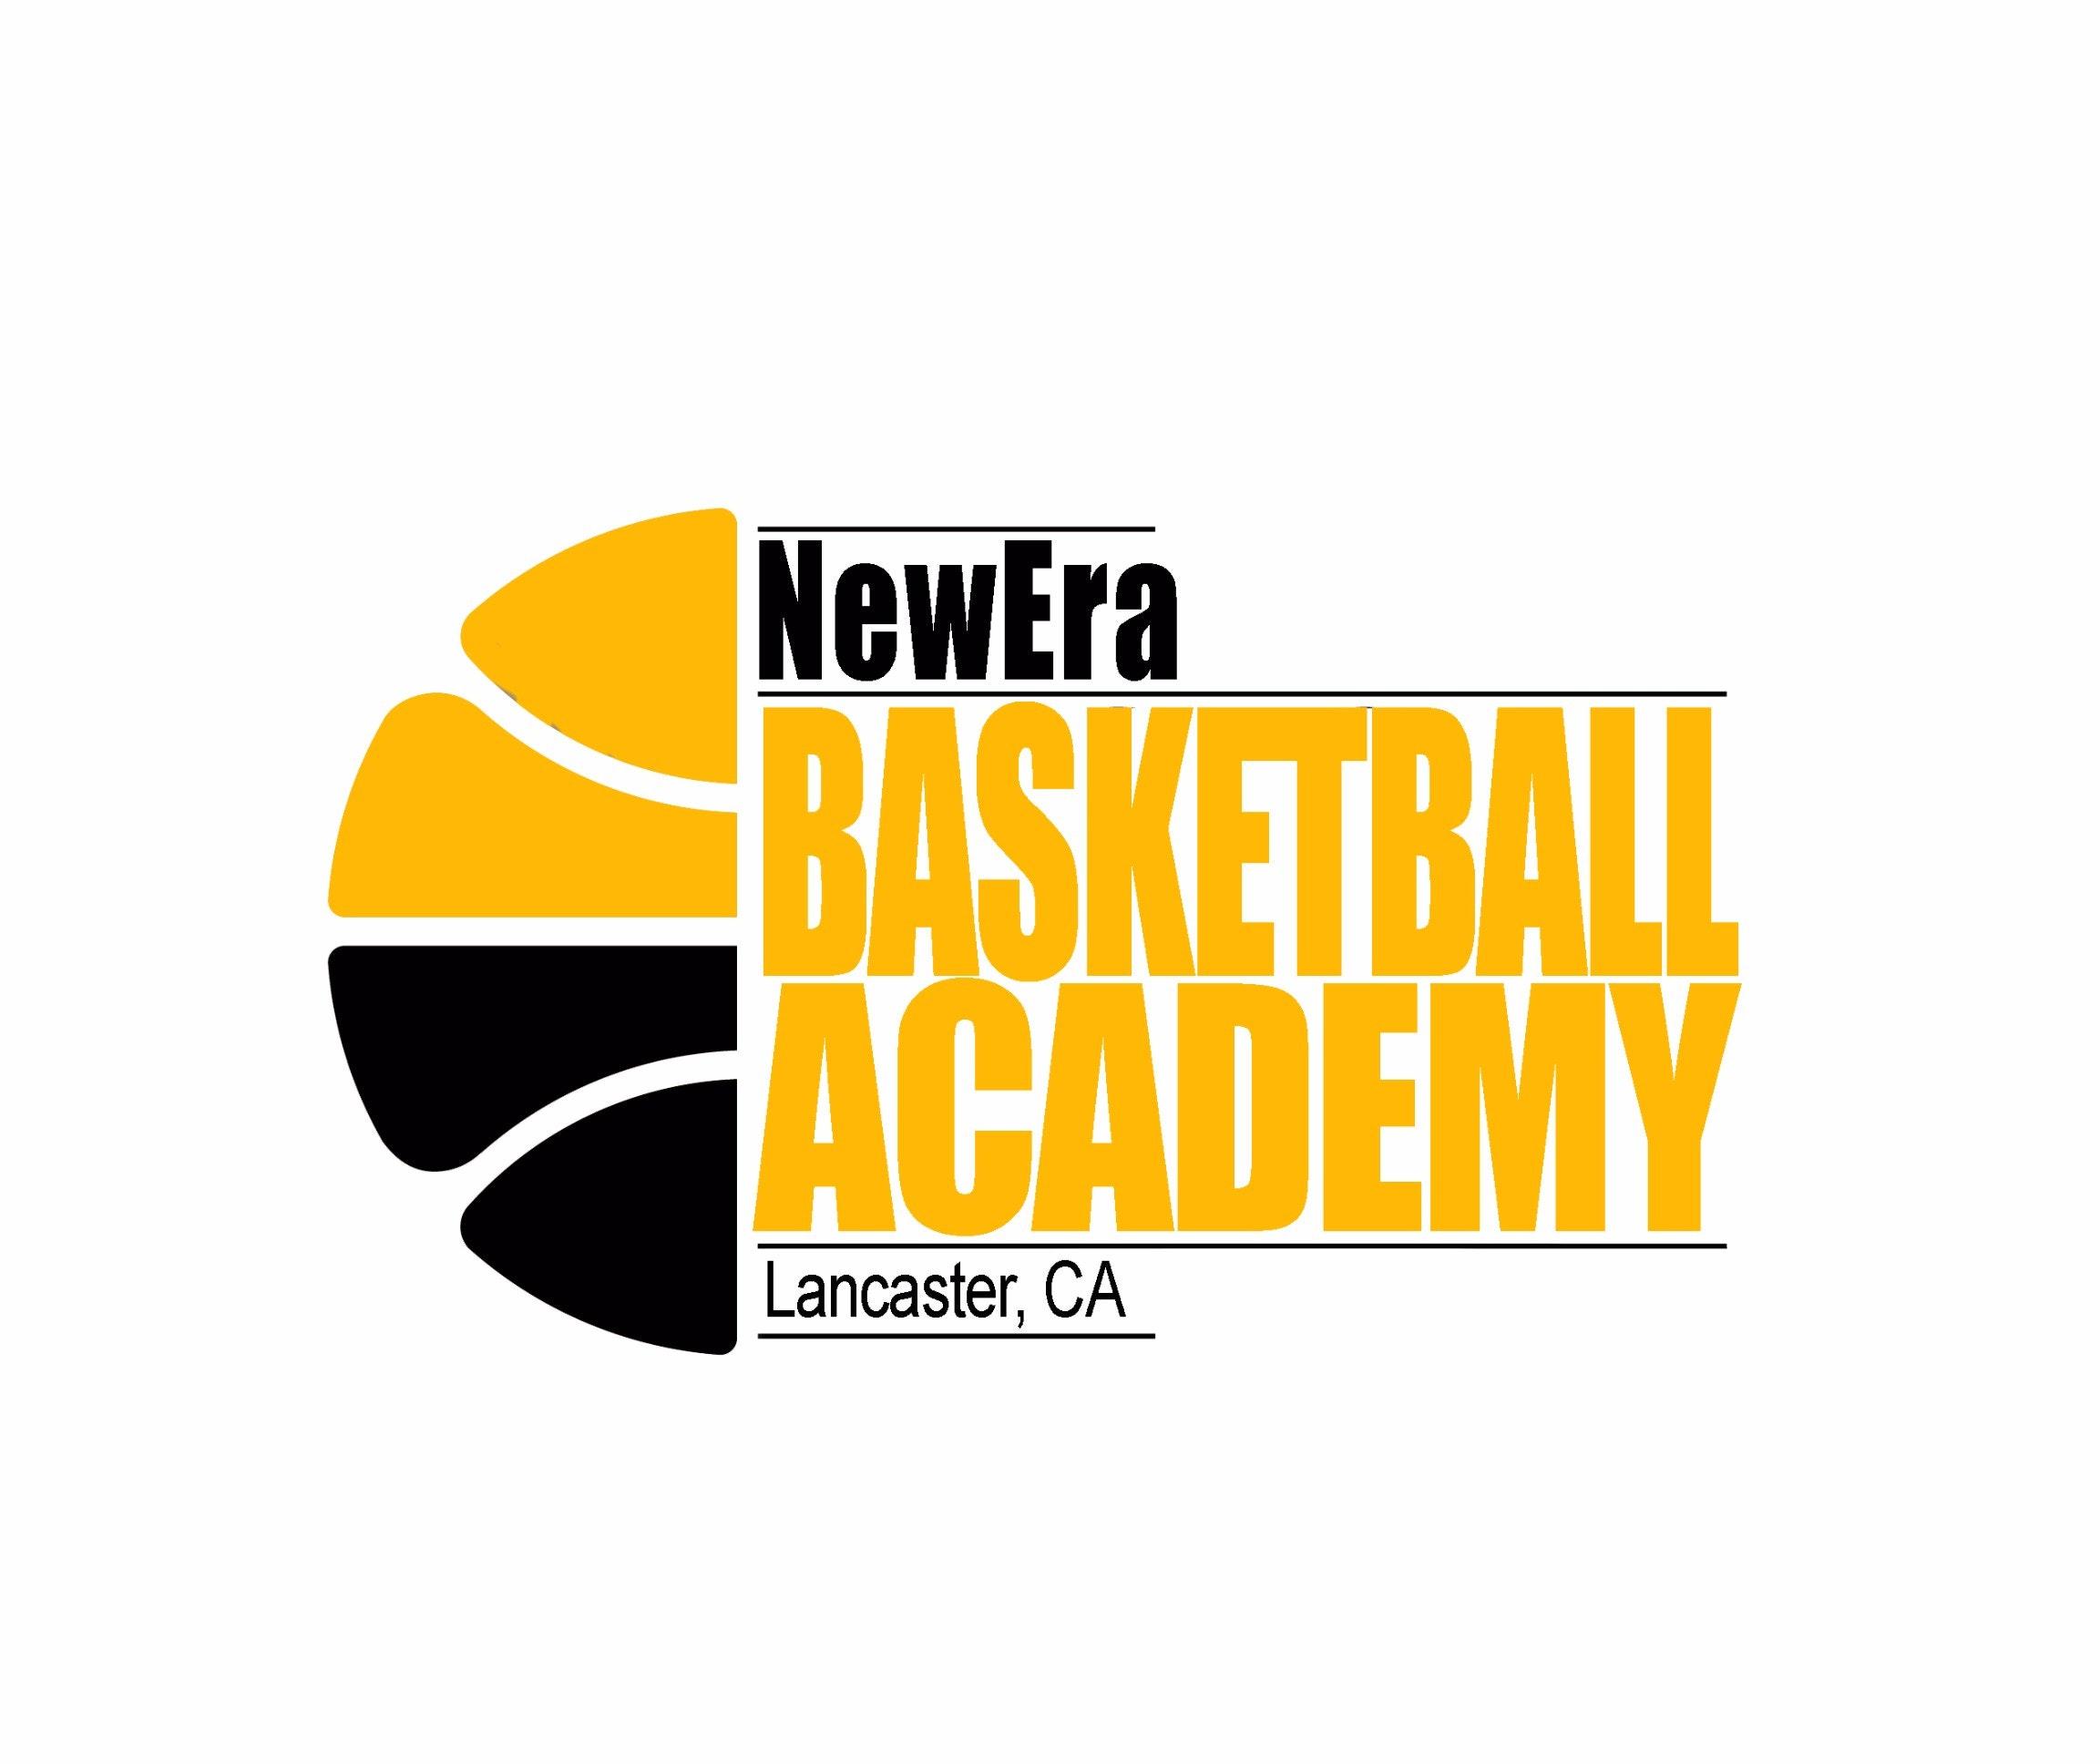 New Era Basketball Academy